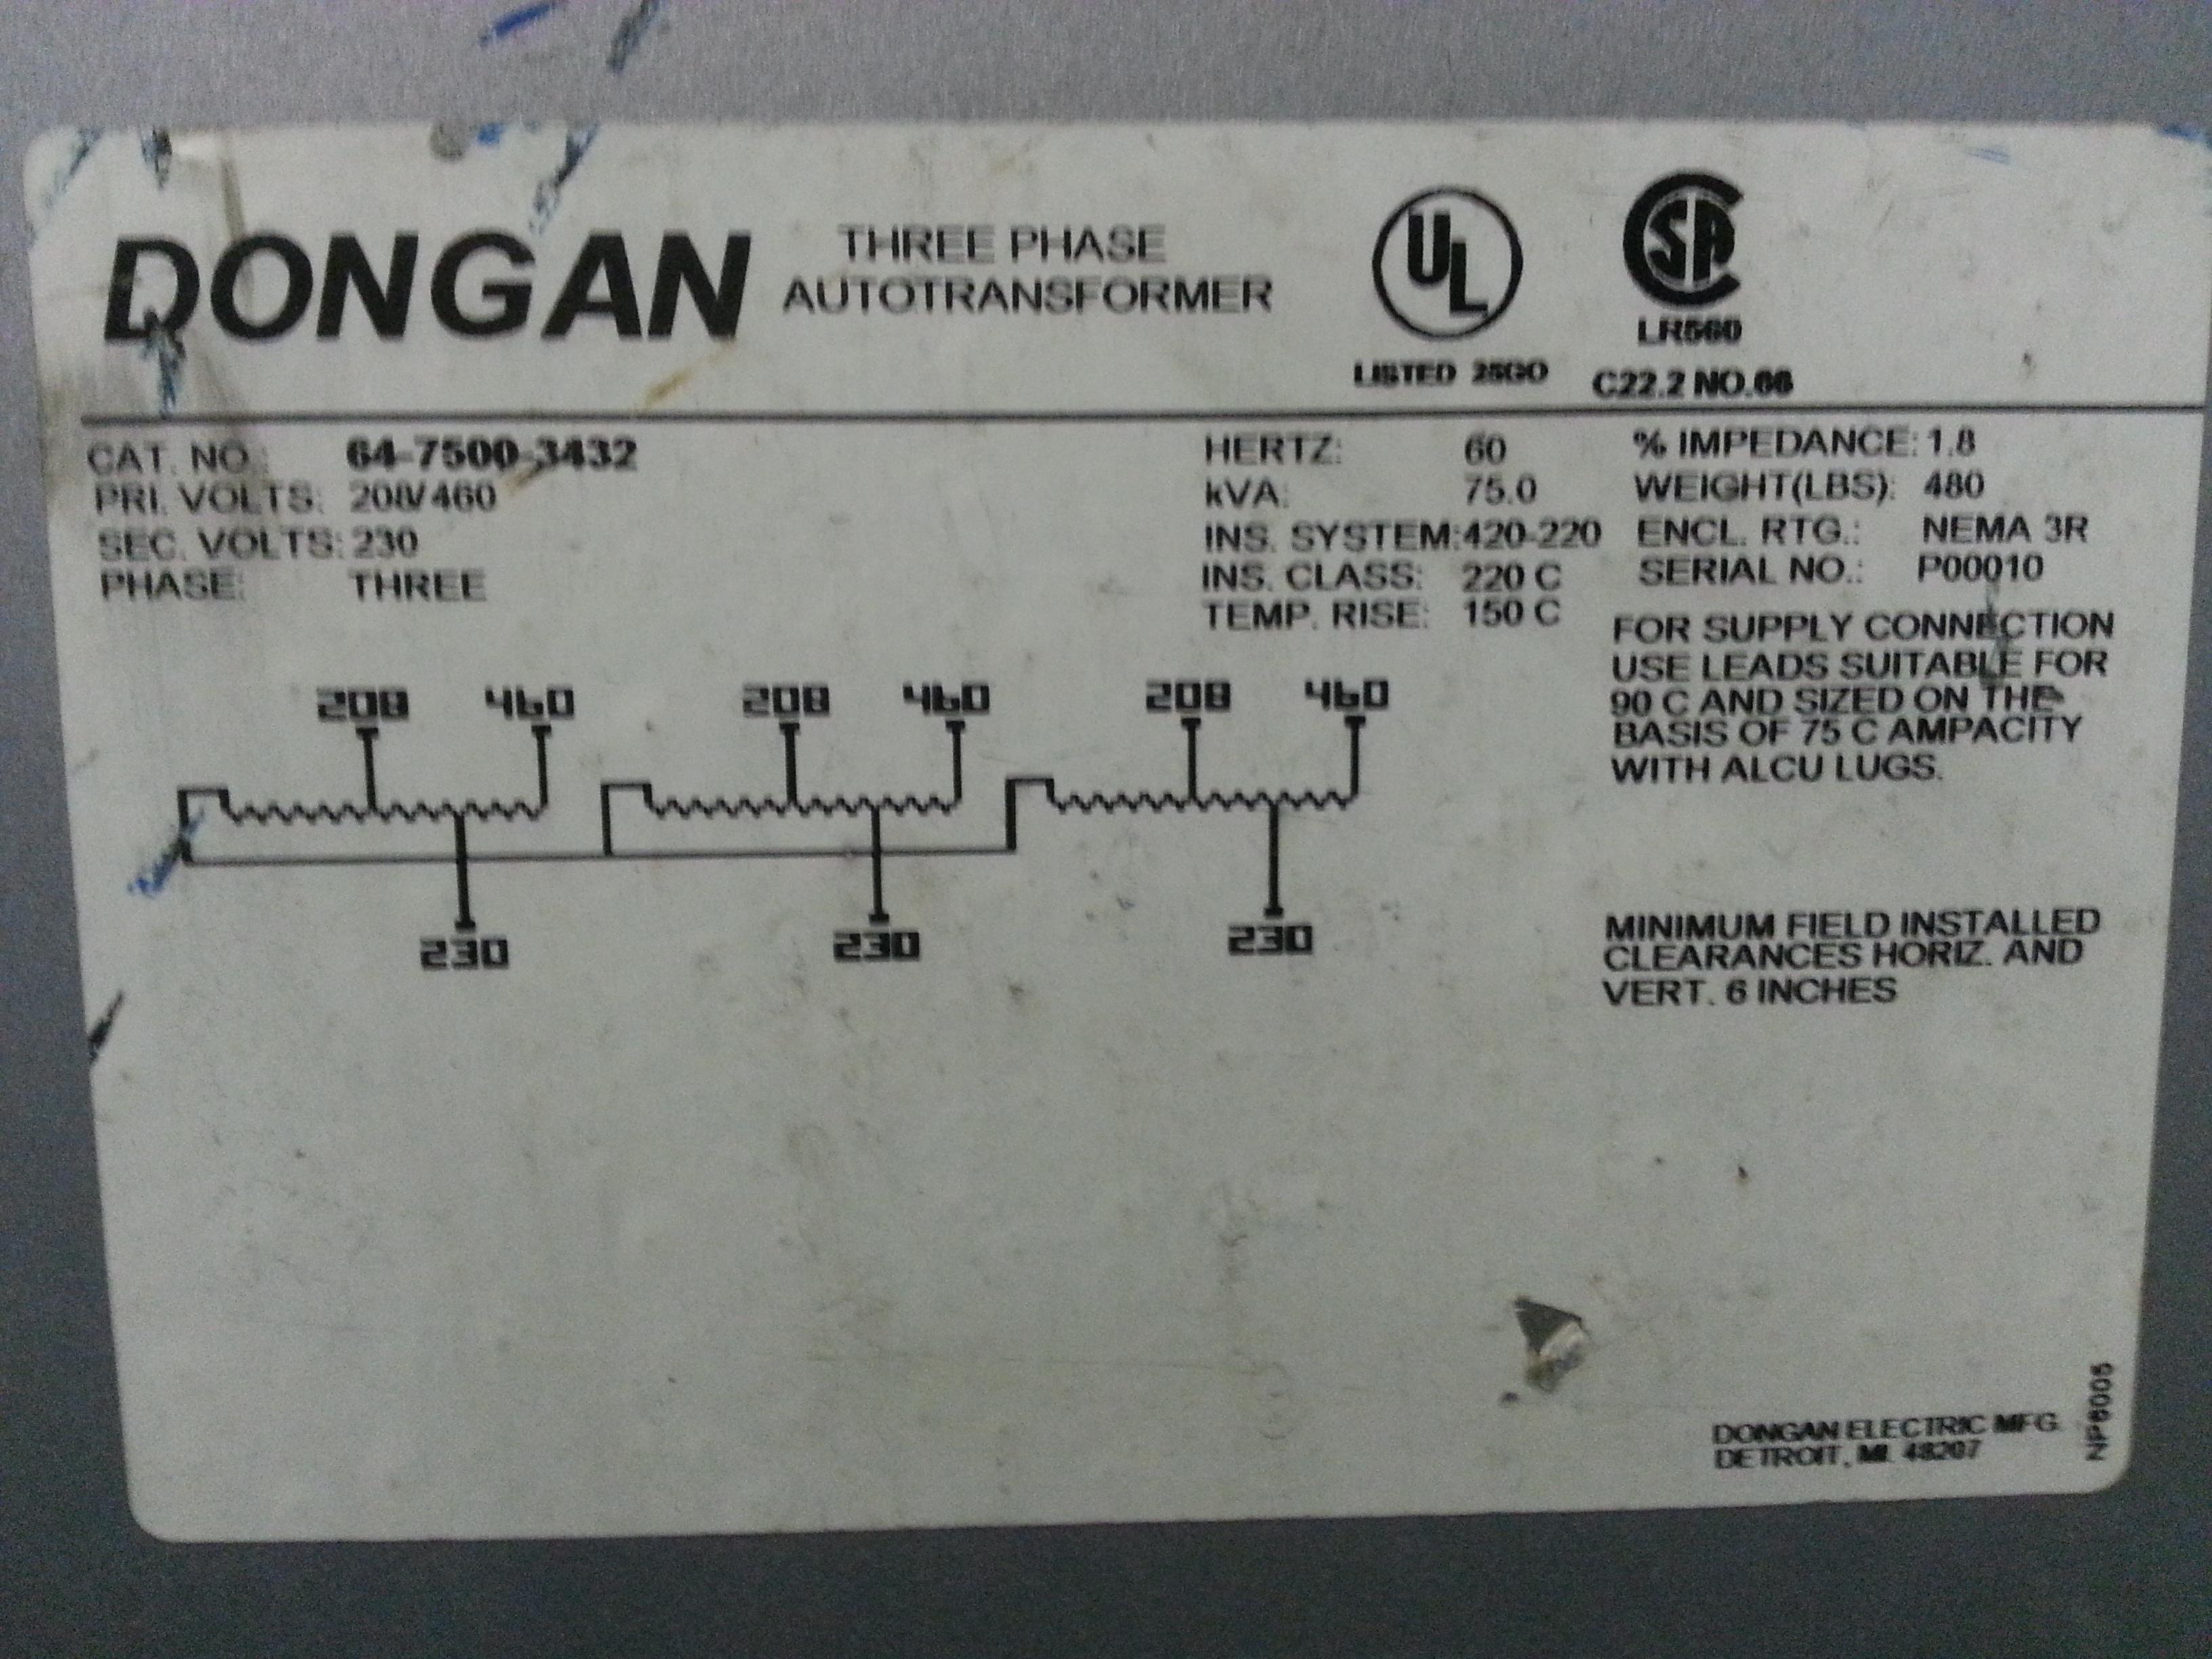 (1) PREOWNED DONGAN AUTO TRANSFORMER, 3 PHASE, 75 KVA<br>MODEL 64-7500-3432, SN P00010